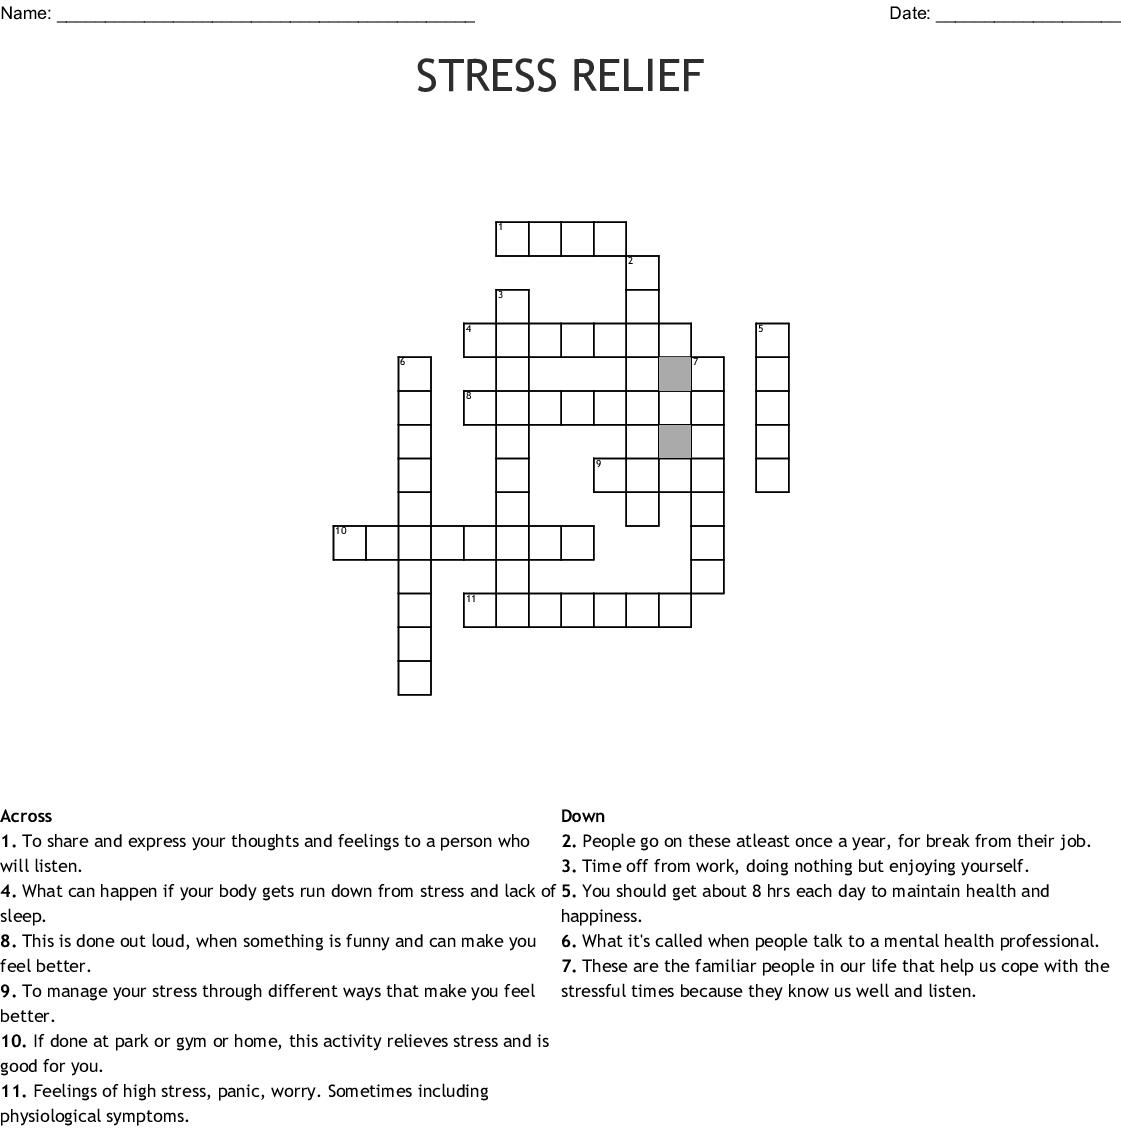 Stress Relief Crossword - Wordmint - Printable Stress Management Crossword Puzzle